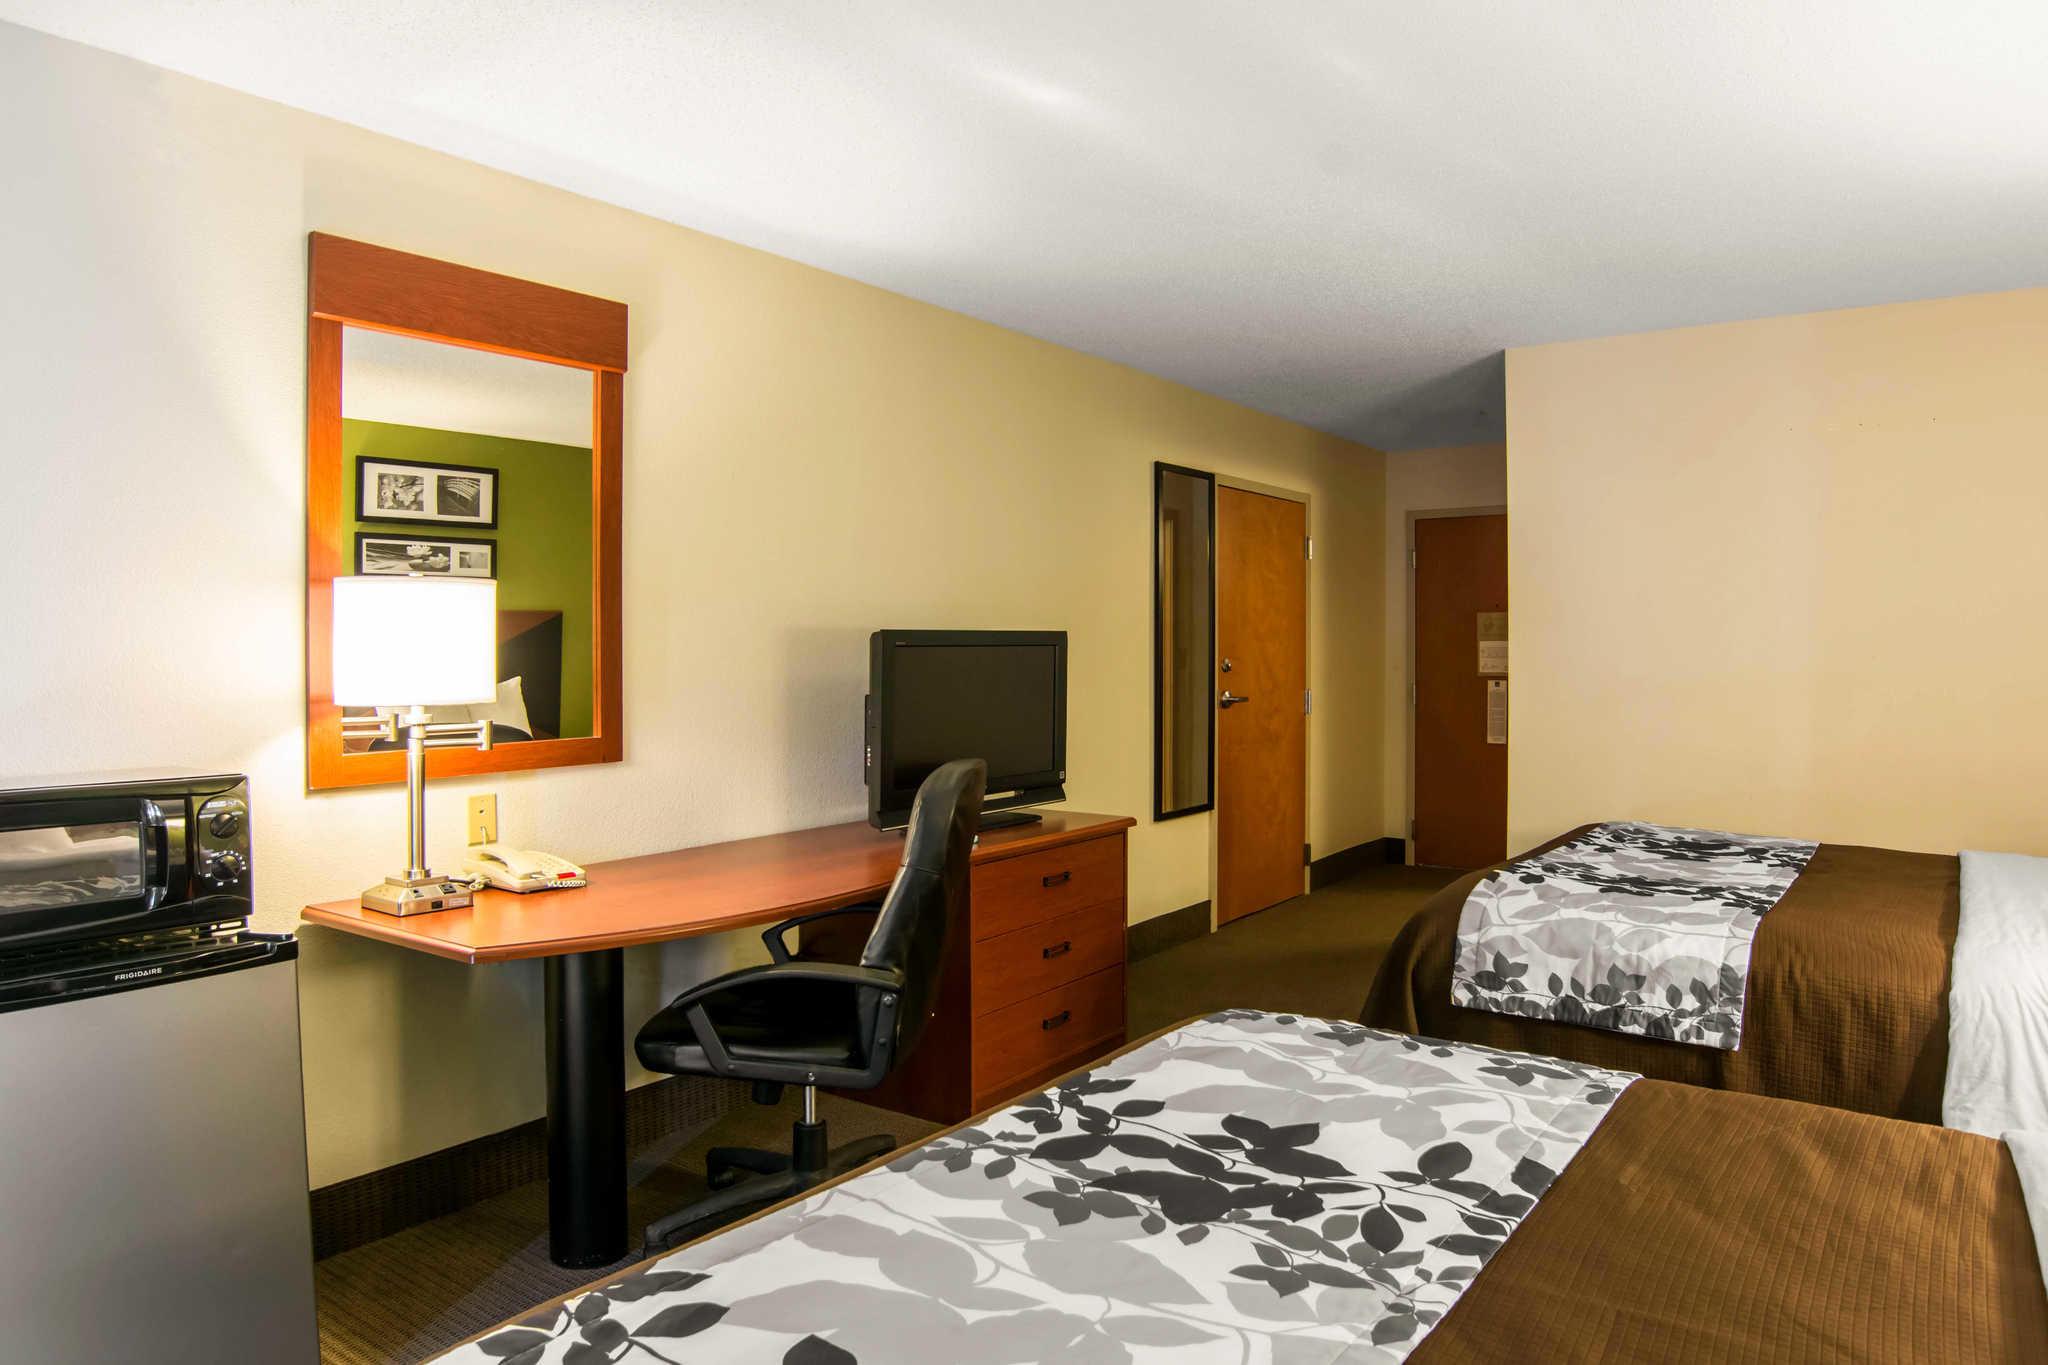 Sleep Inn & Suites At Fort Lee image 14